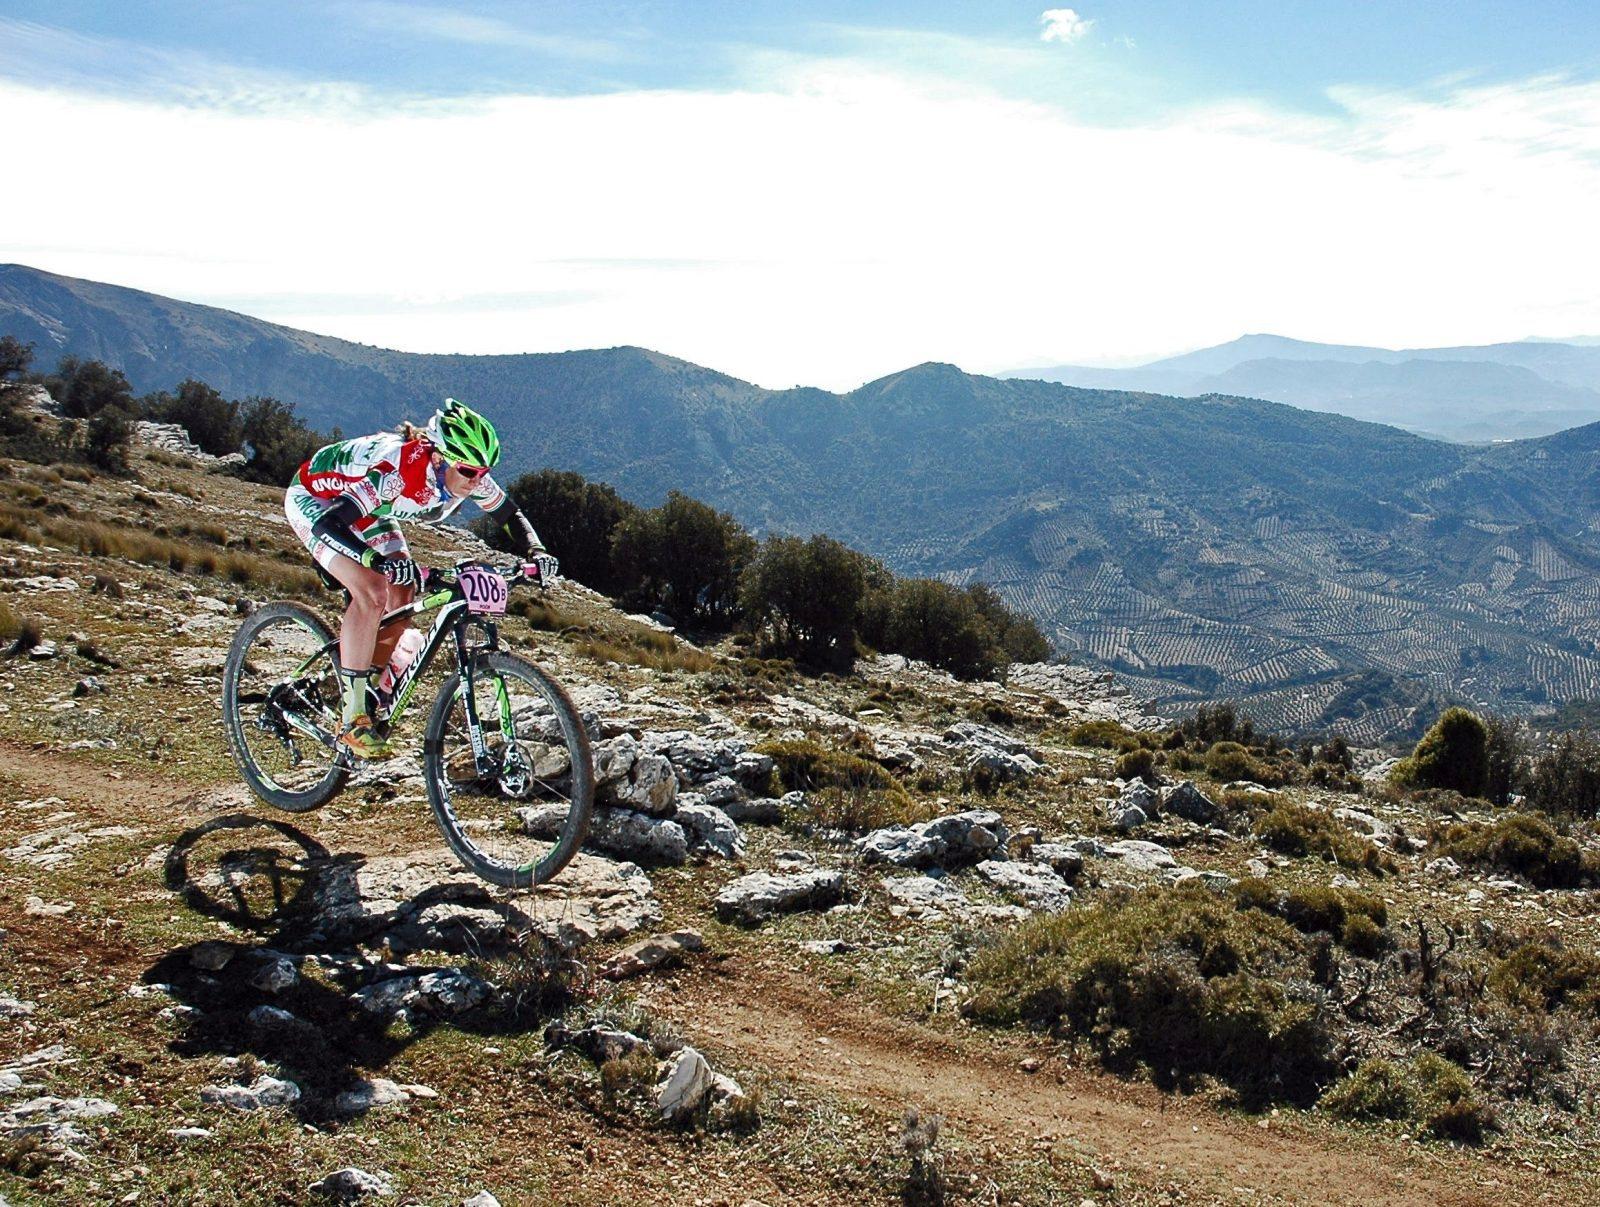 andalucia_bike_race_poor_brigitta_05